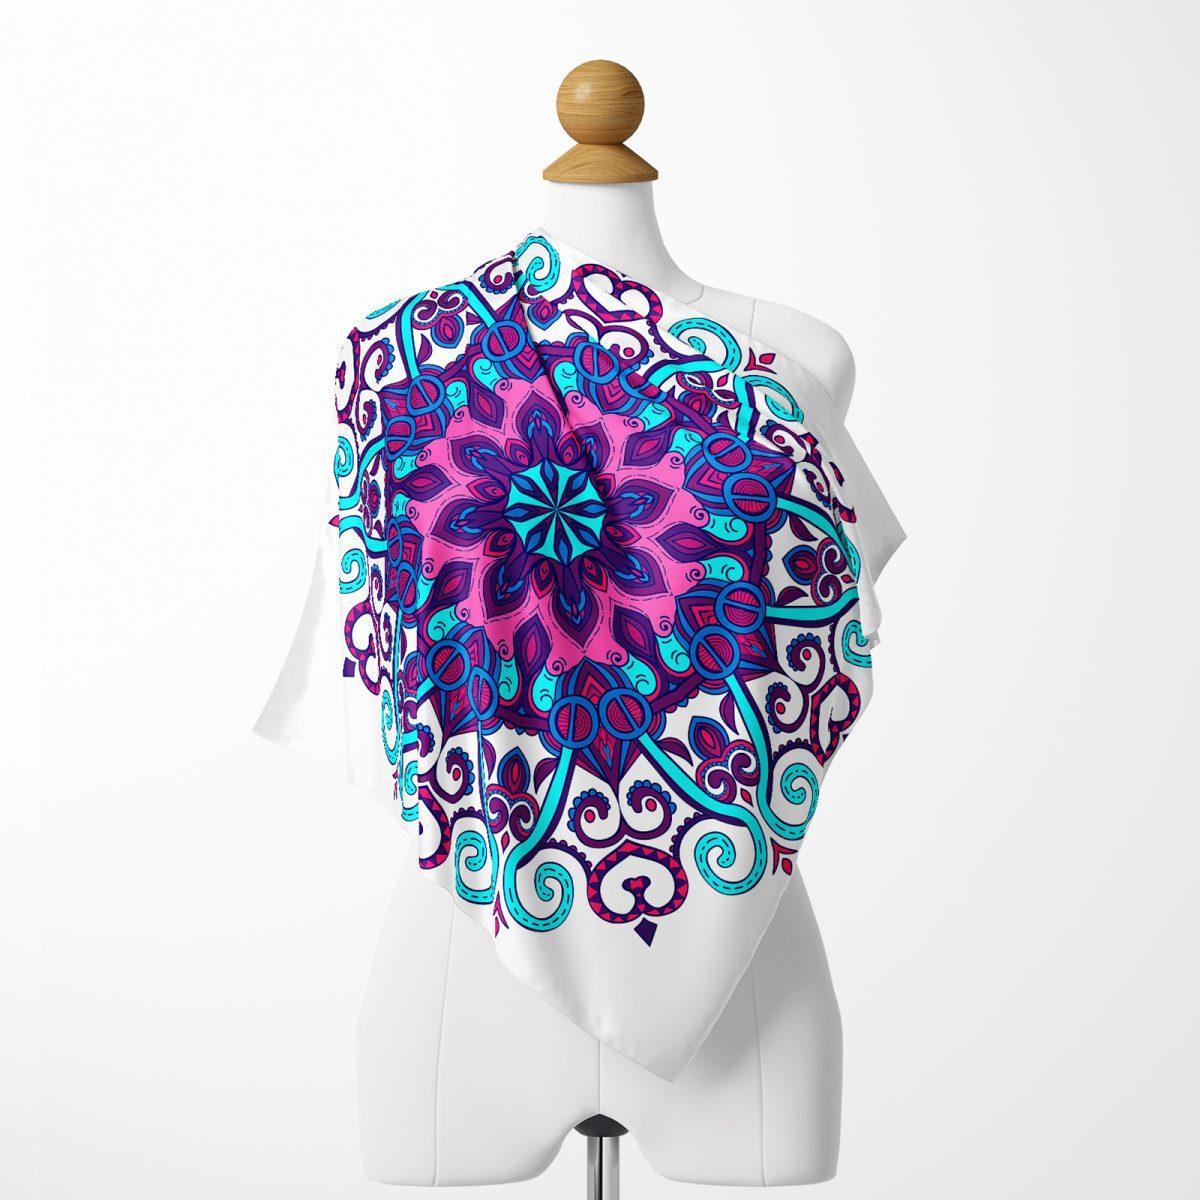 Beyaz Zeminde Mor ve Pembe Çini Tasarımlı Realhomes